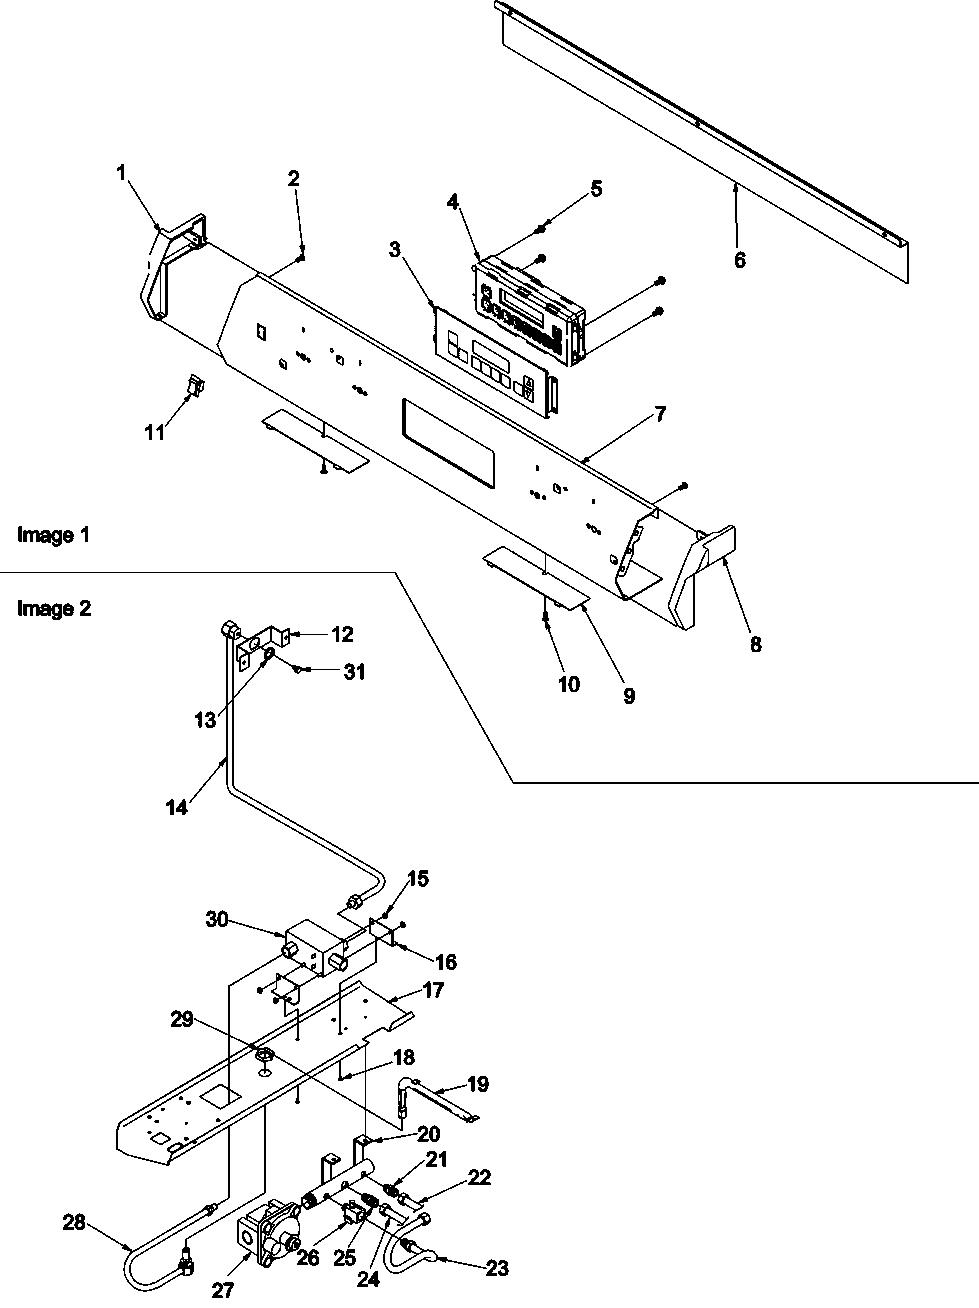 Control Cabinet Wiring Diagram